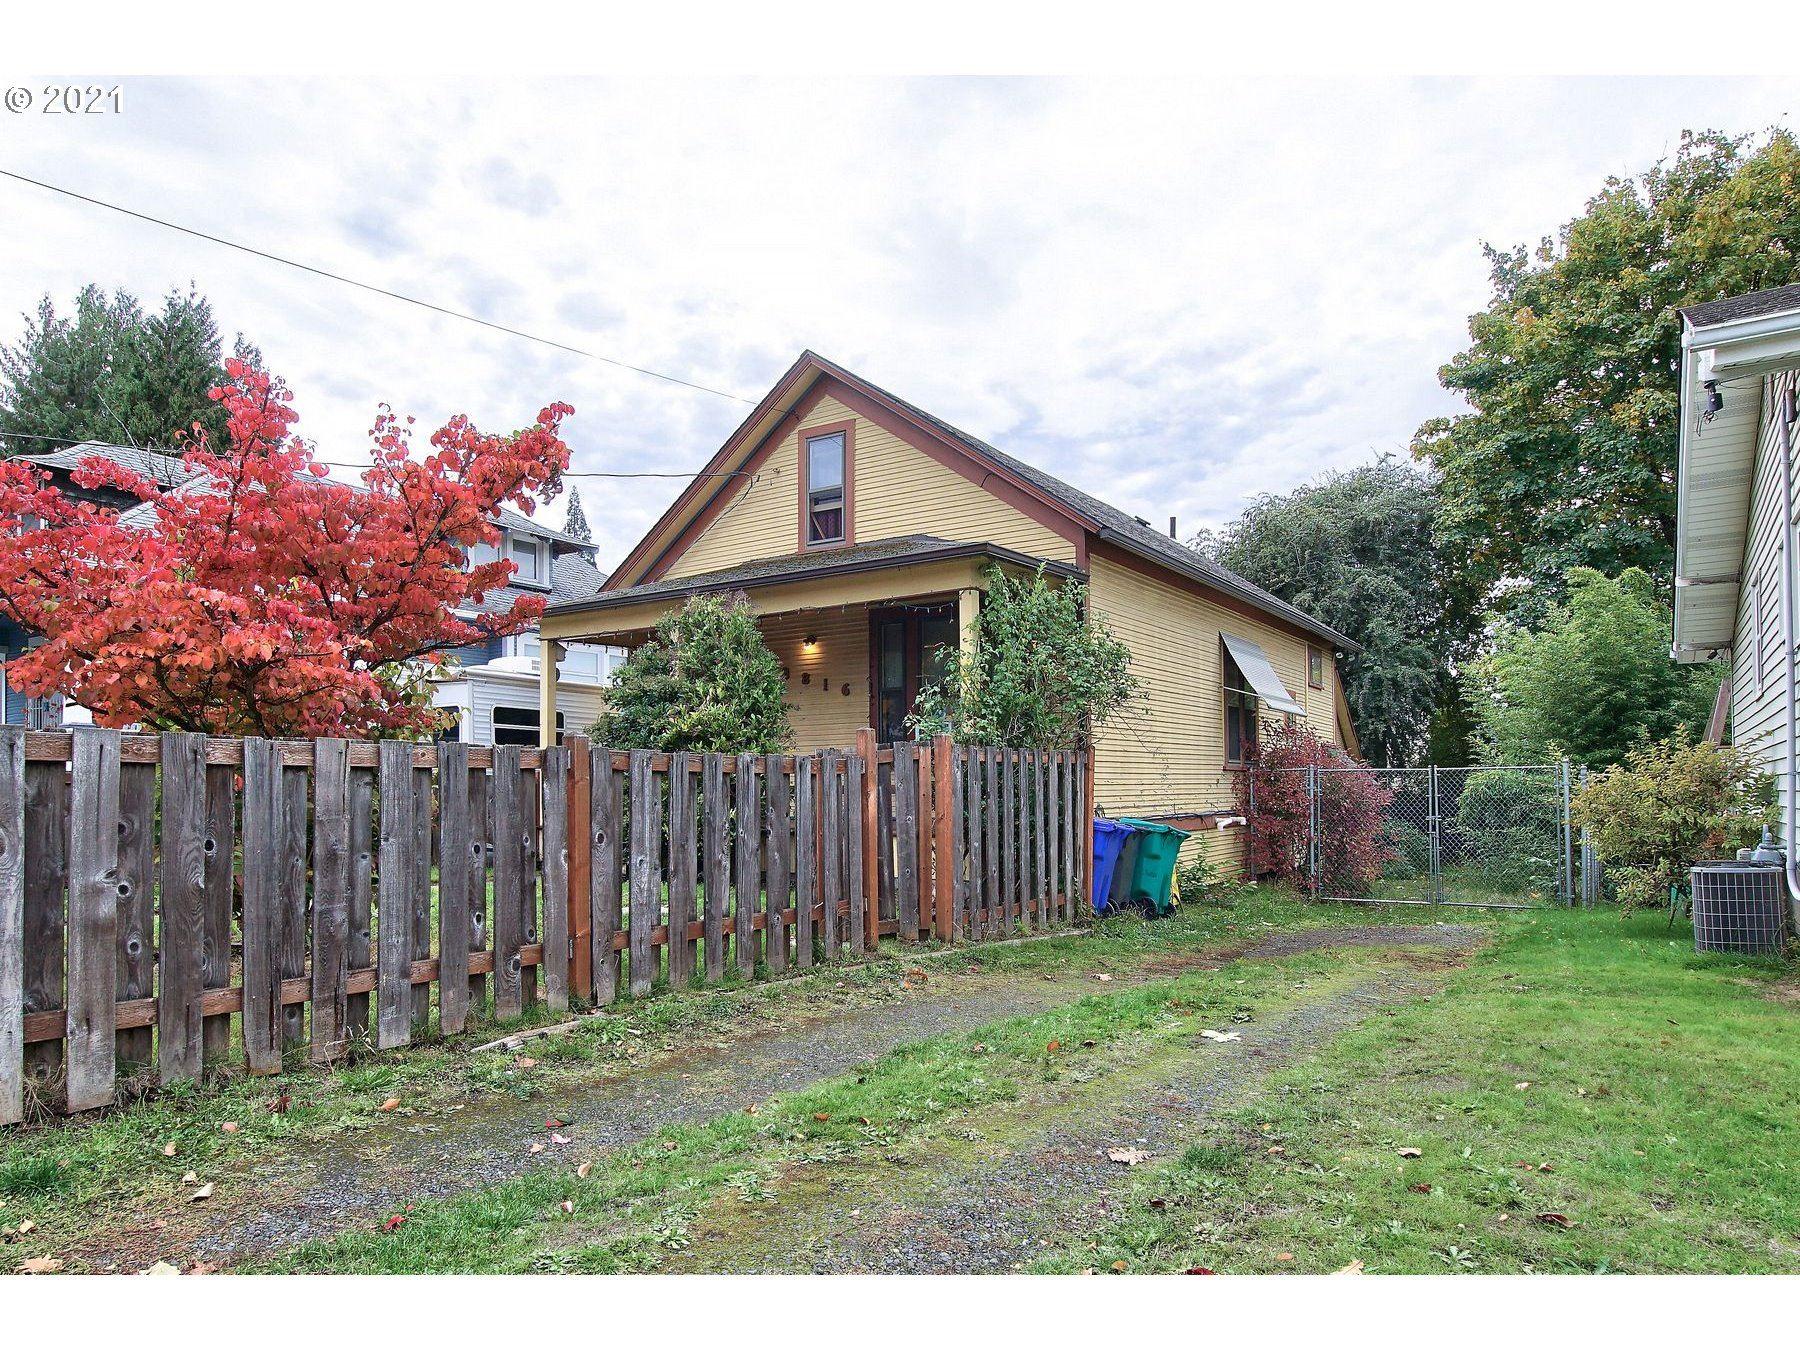 3816 SE GLADSTONE ST, Portland, OR 97202 - MLS#: 21664067